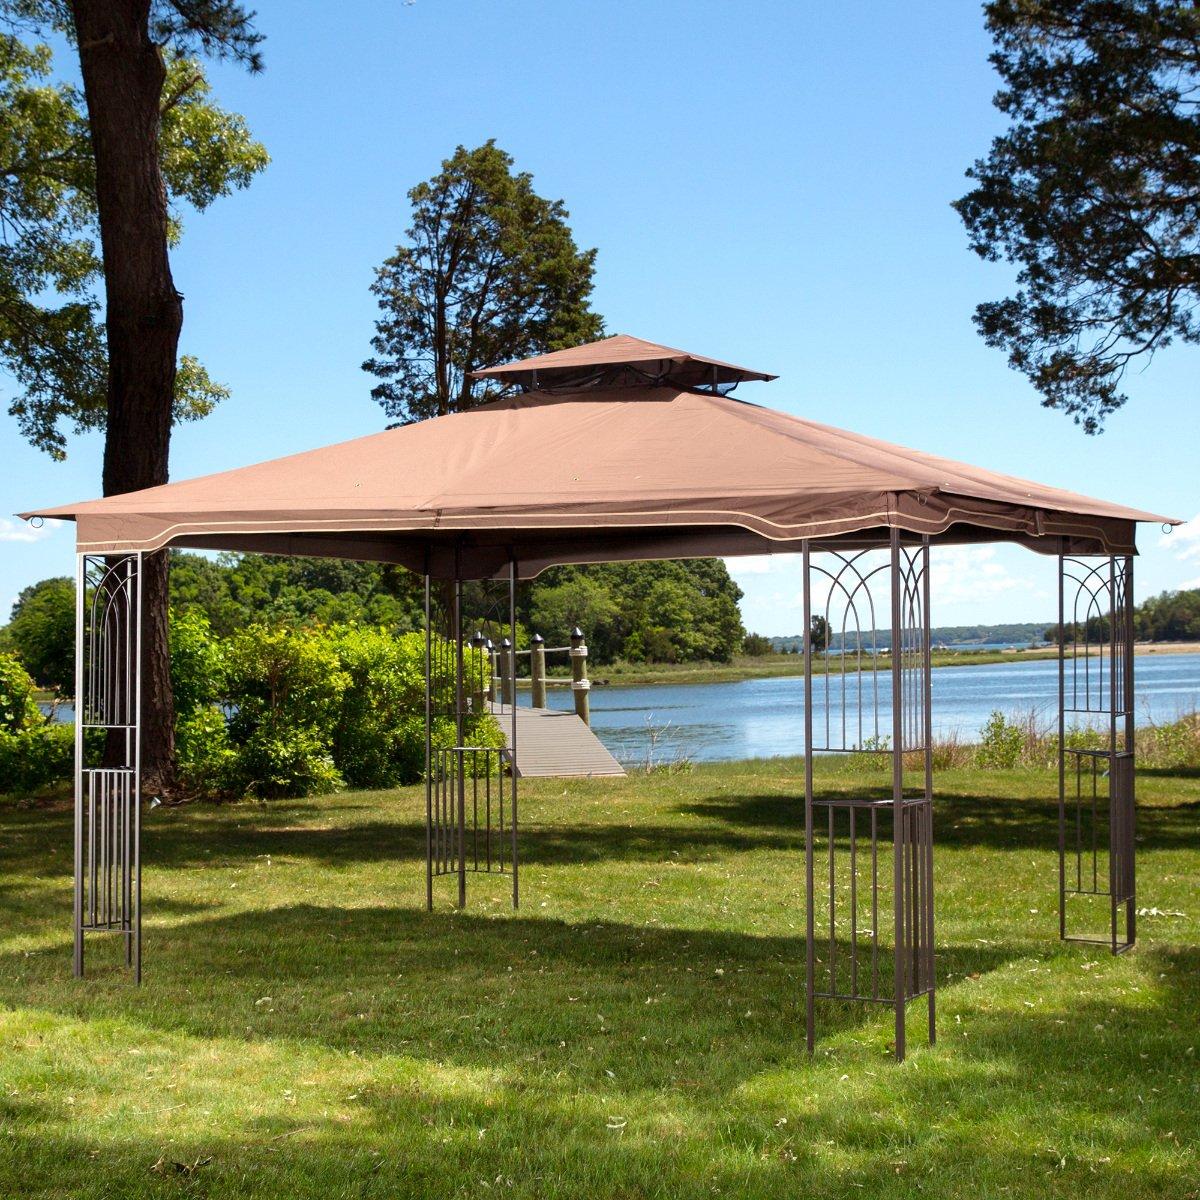 Steel Framed Gazebos : Gazebo metal frame canopy mosquito netting outdoor